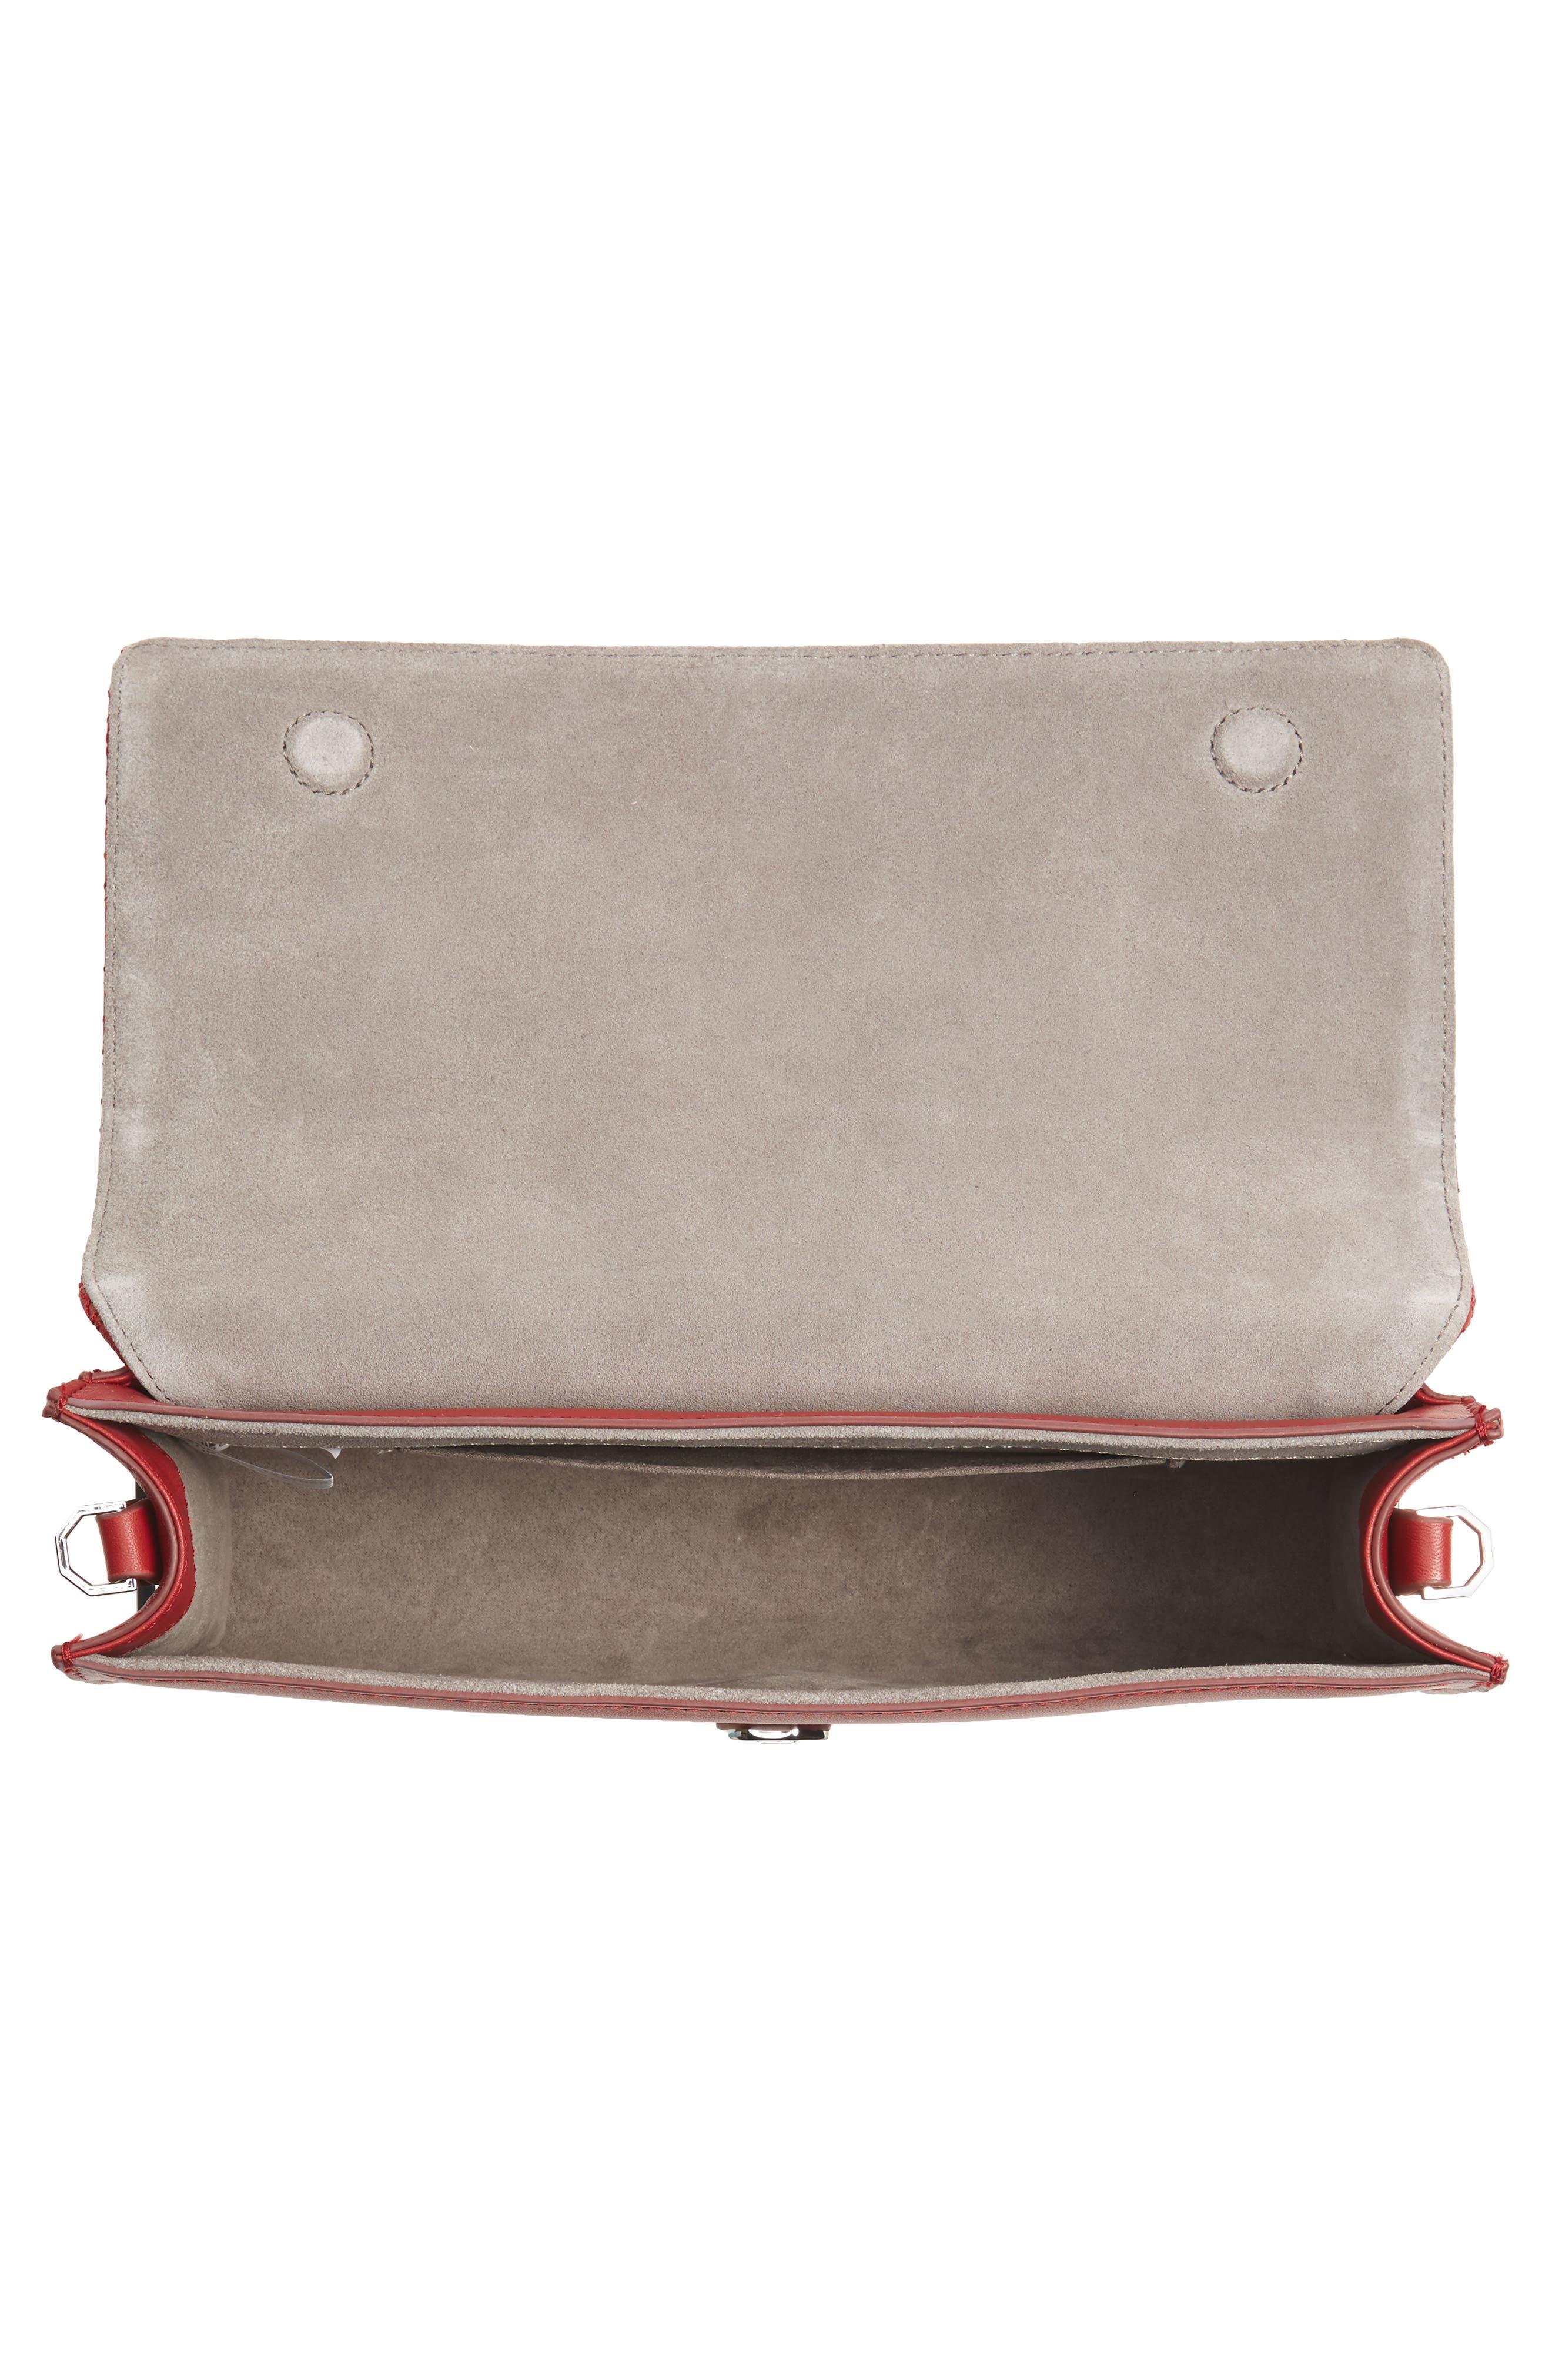 'Yvet' Leather Flap Clutch,                             Alternate thumbnail 4, color,                             600